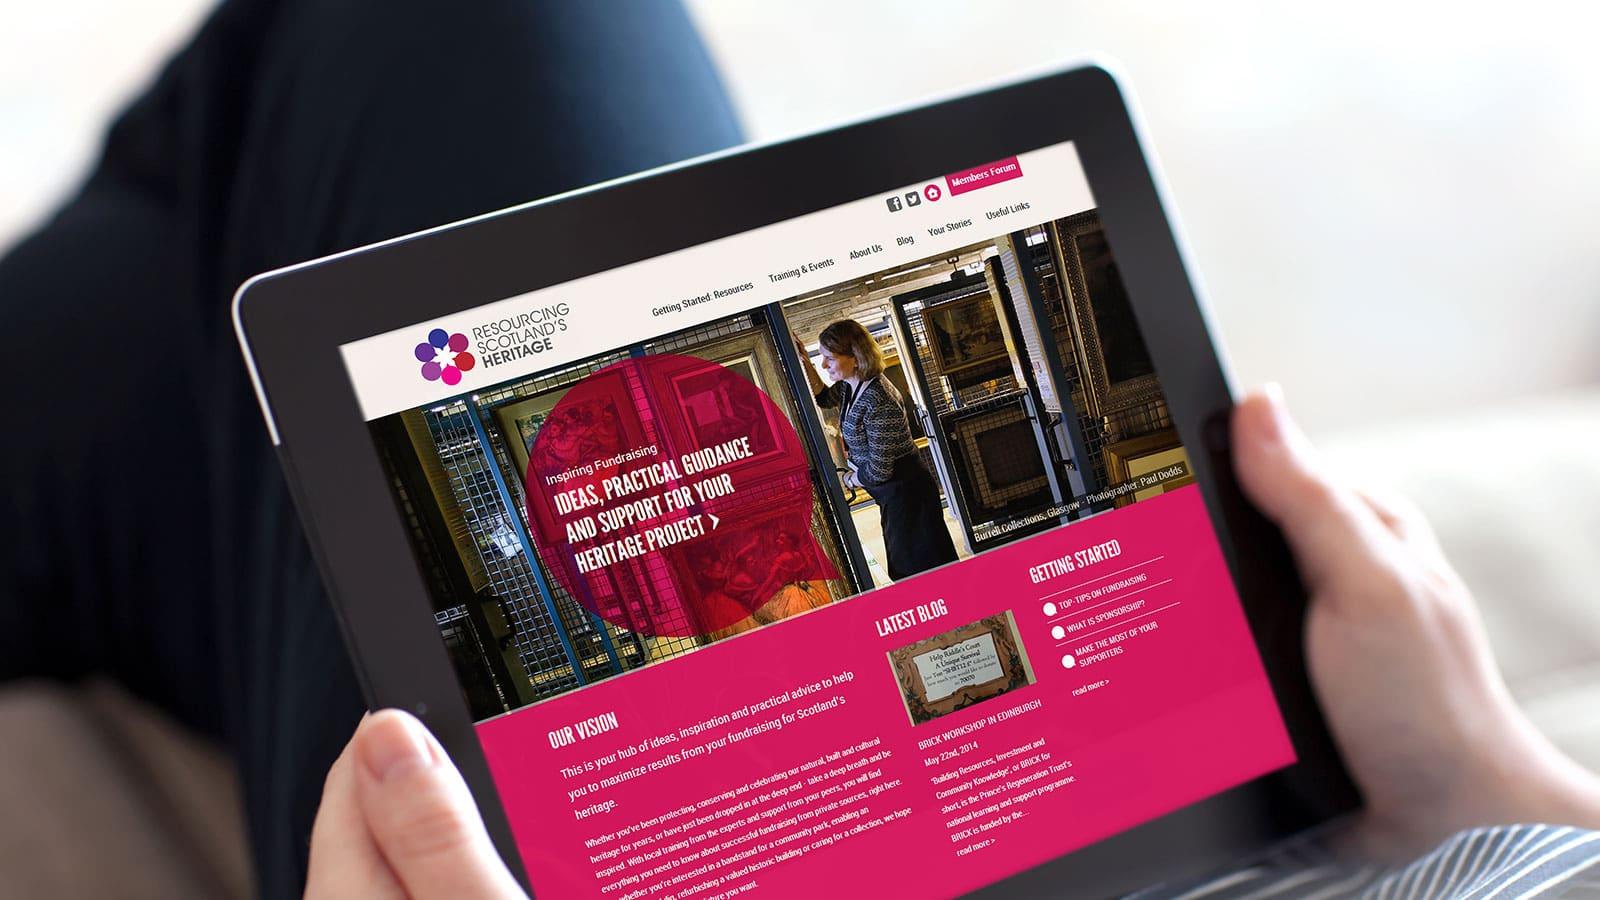 RSH Homepage image on ipad